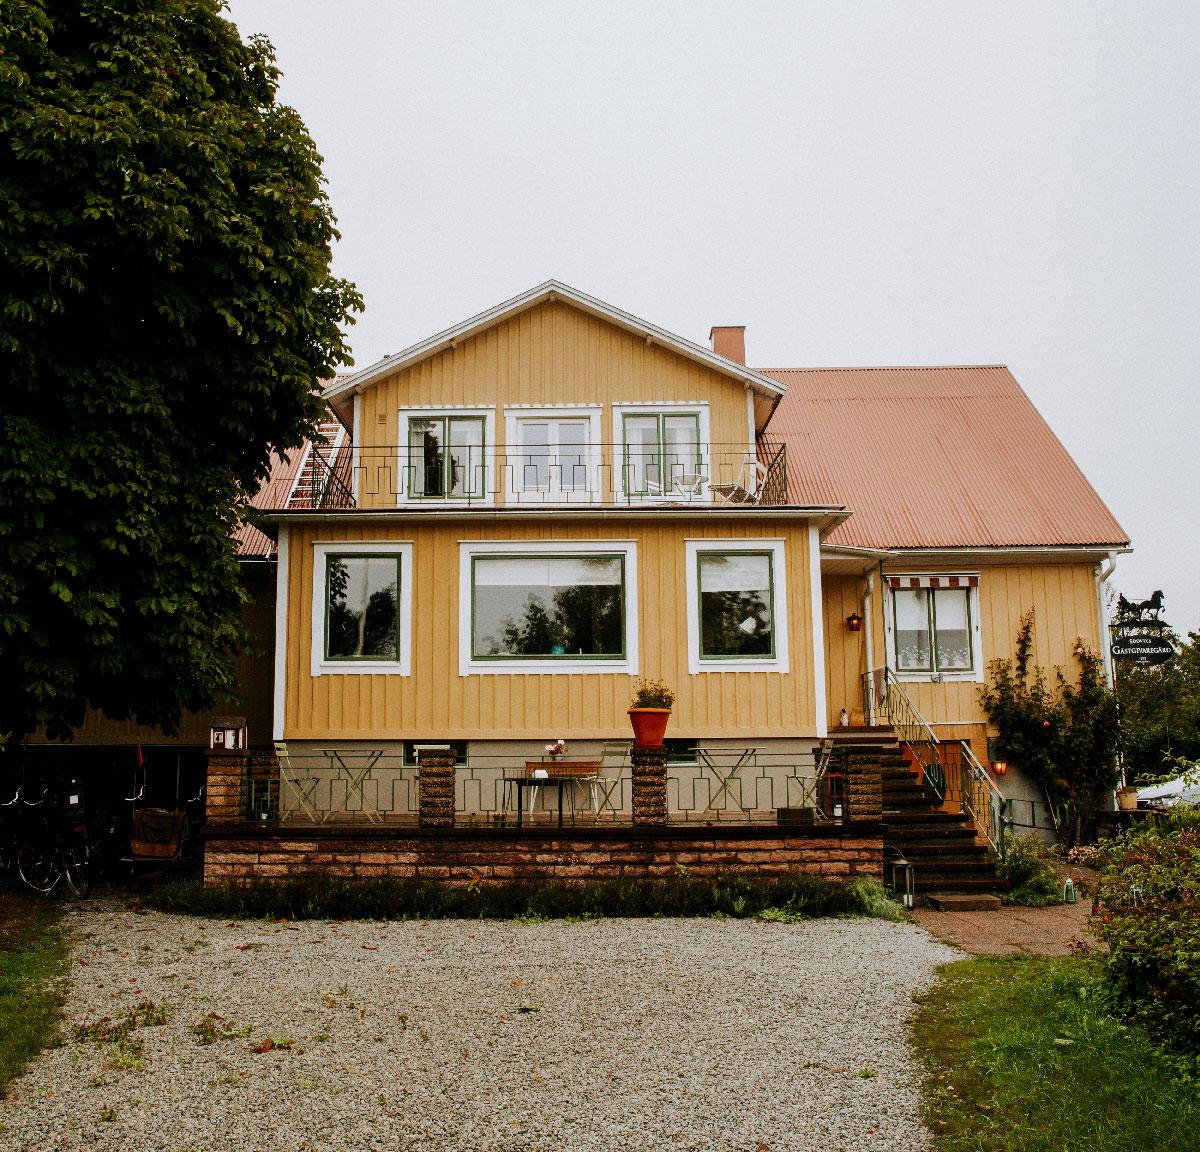 Södviks gæstgivergård på Öland